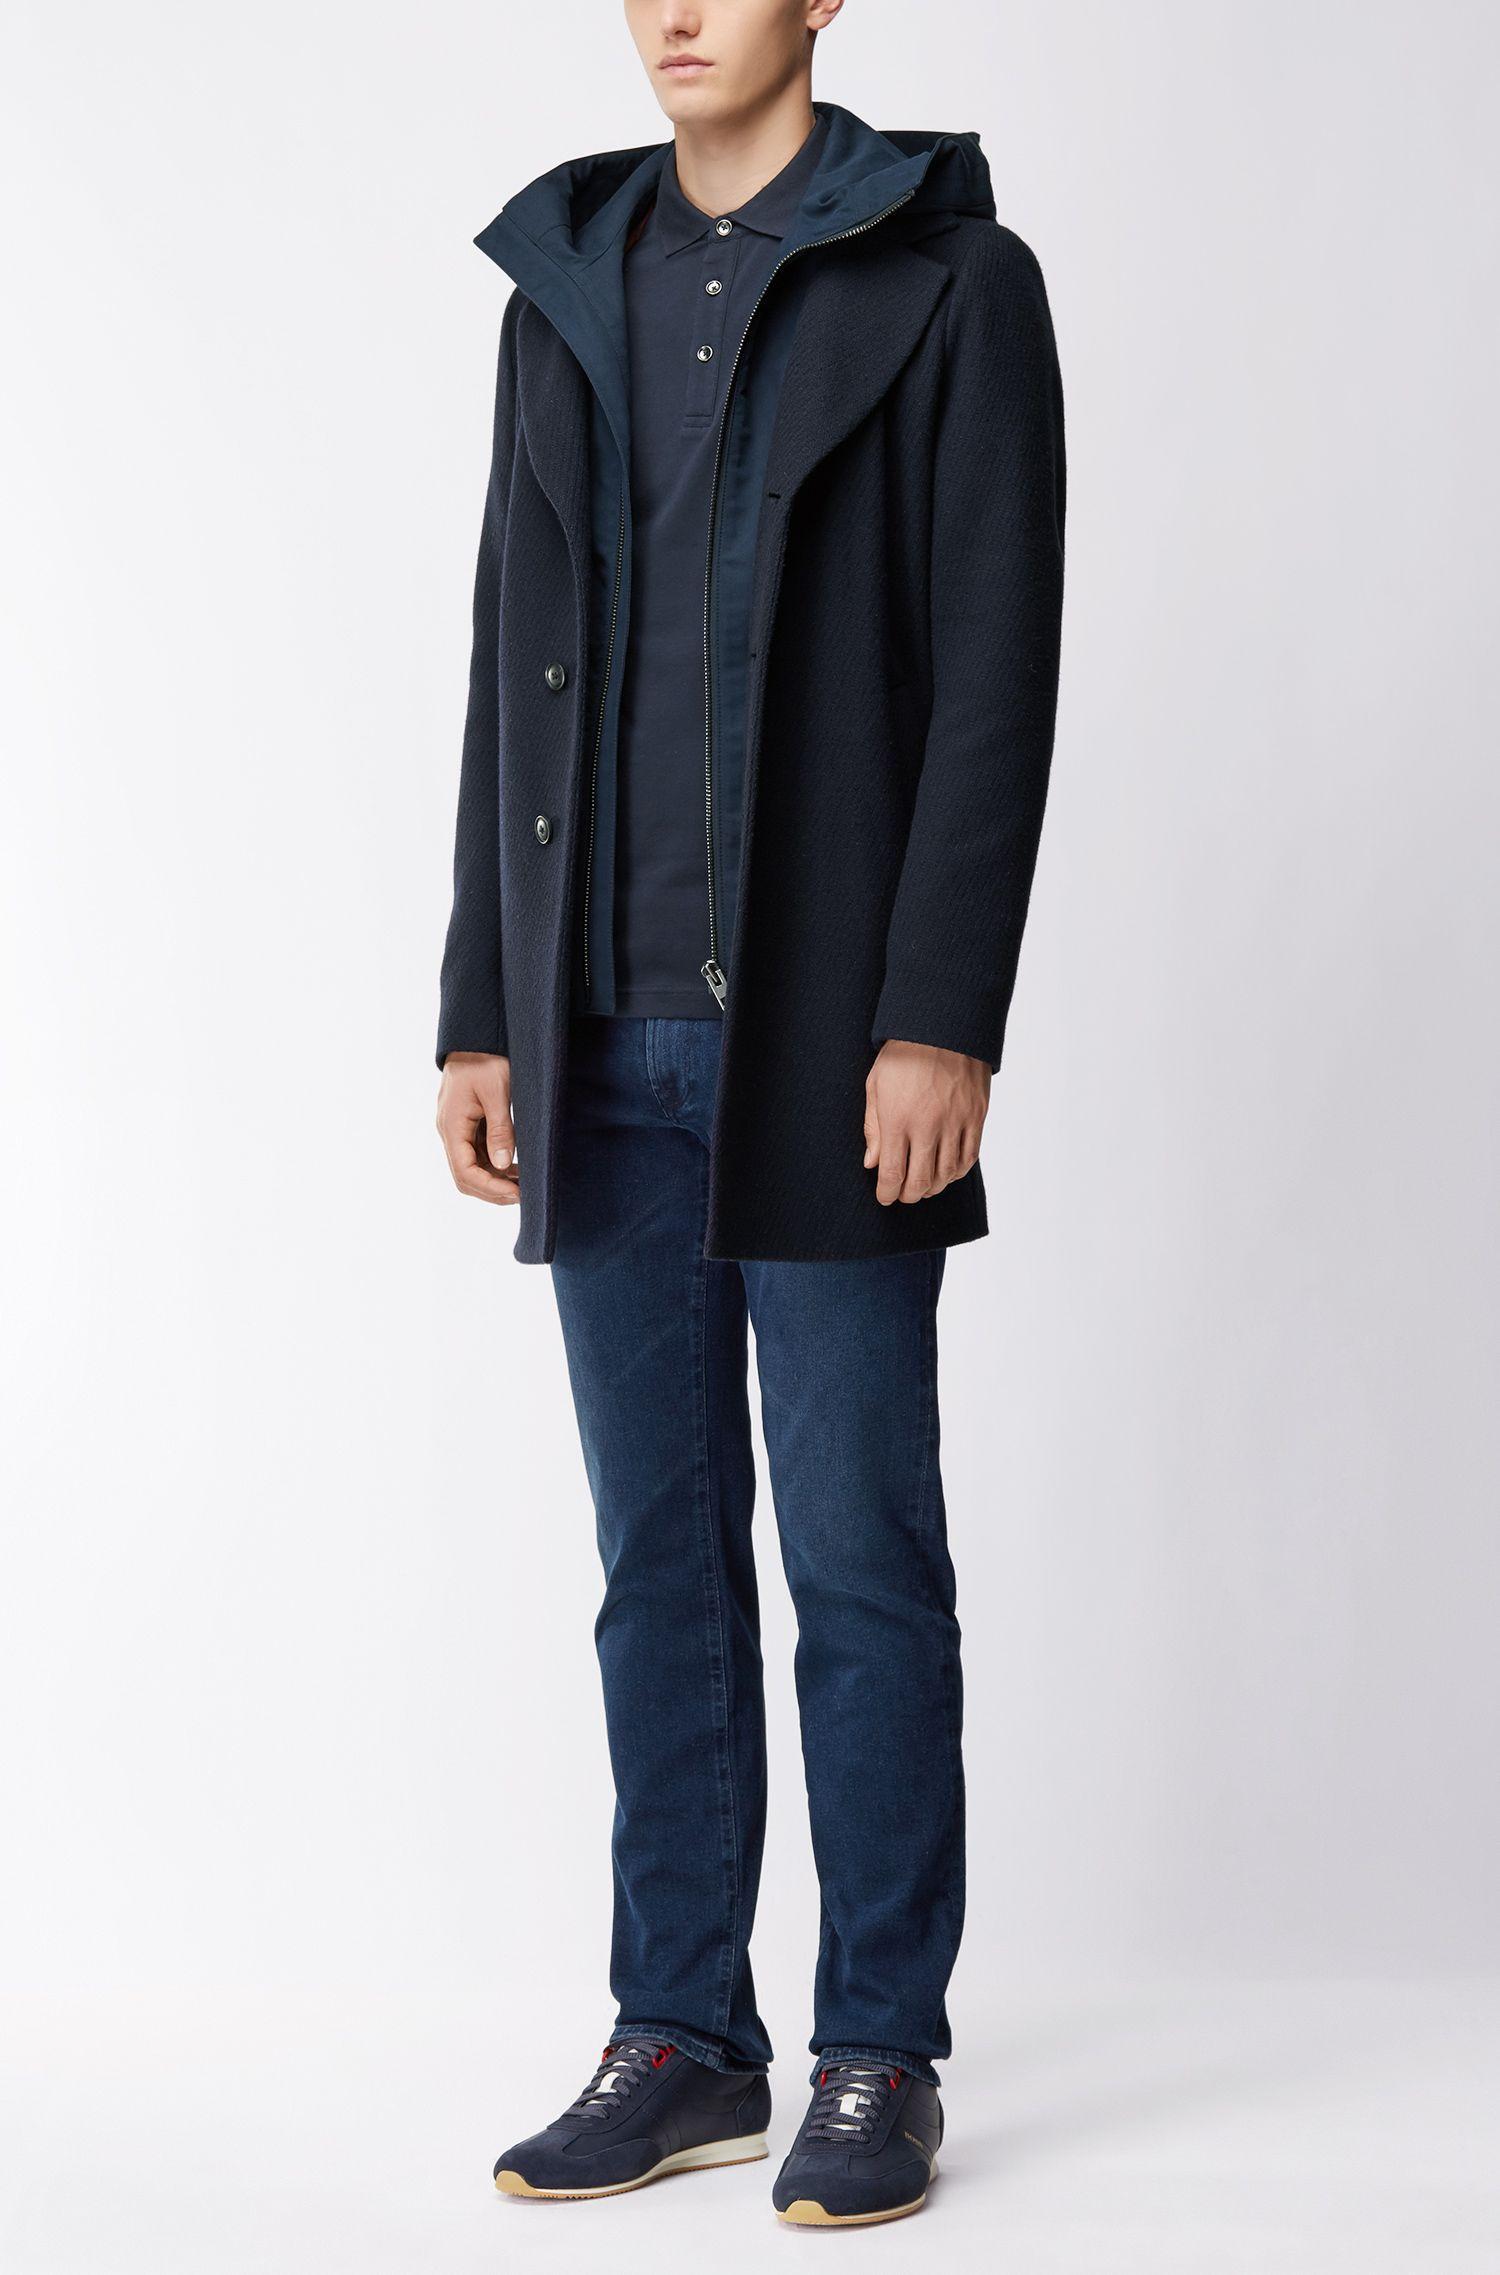 6de7ce11 ... Slim-fit Polo Shirt In Stretch Cotton Piqué for Men - Lyst. Visit HUGO  BOSS. Tap to visit site